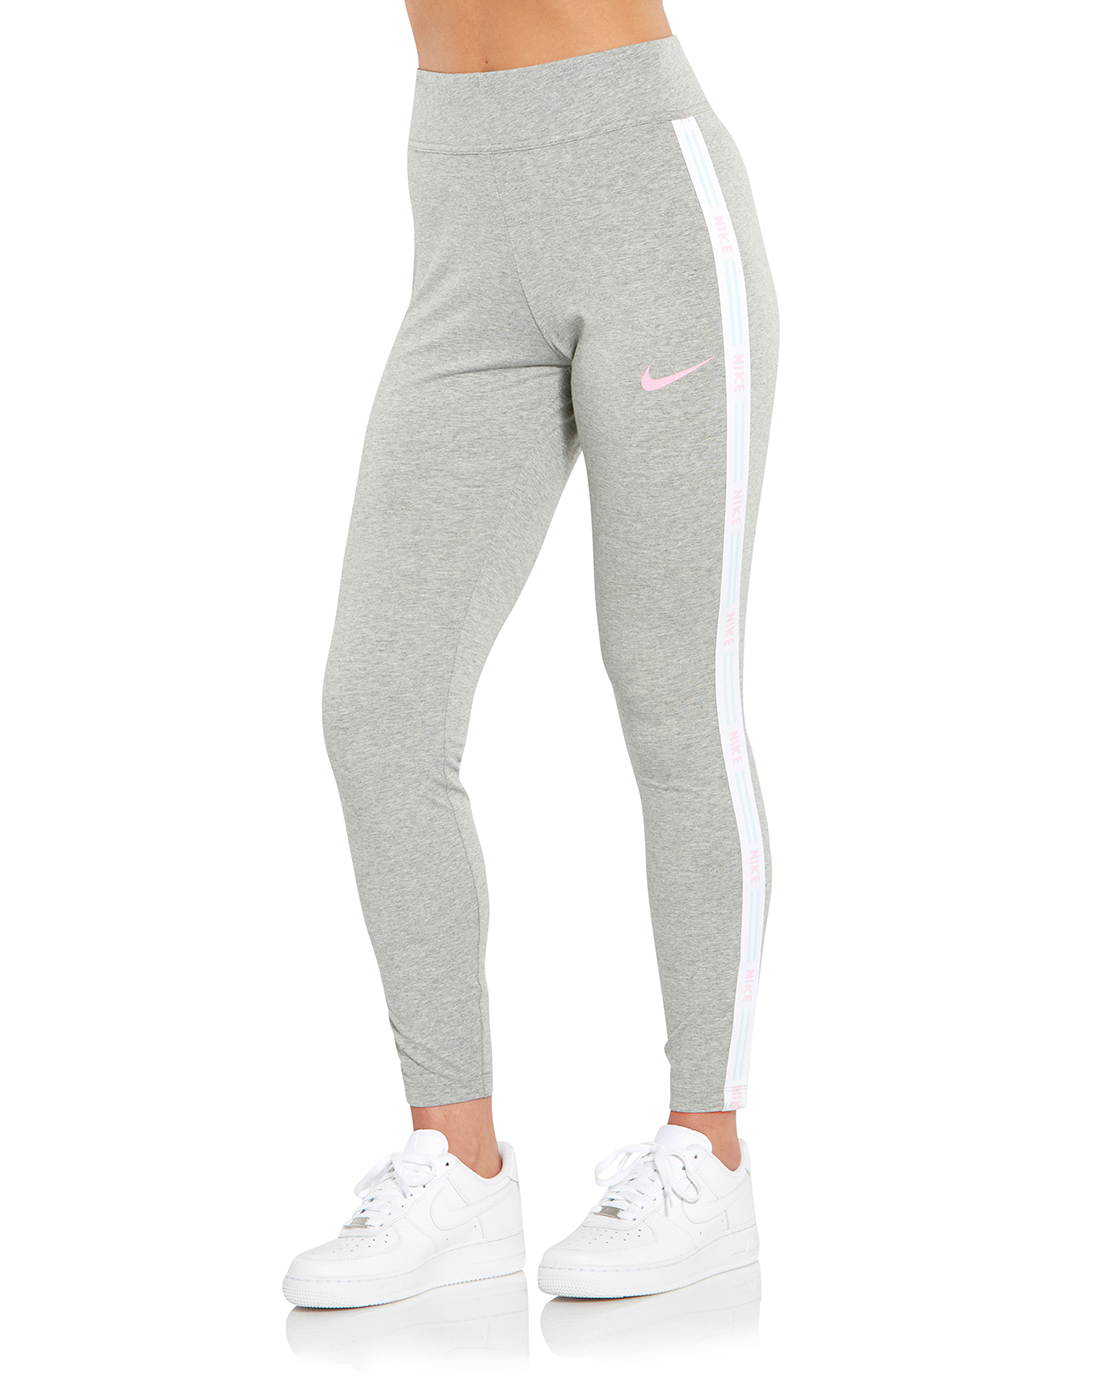 ba4db458bc66f Women's Grey & Pink Nike Leggings | Life Style Sports